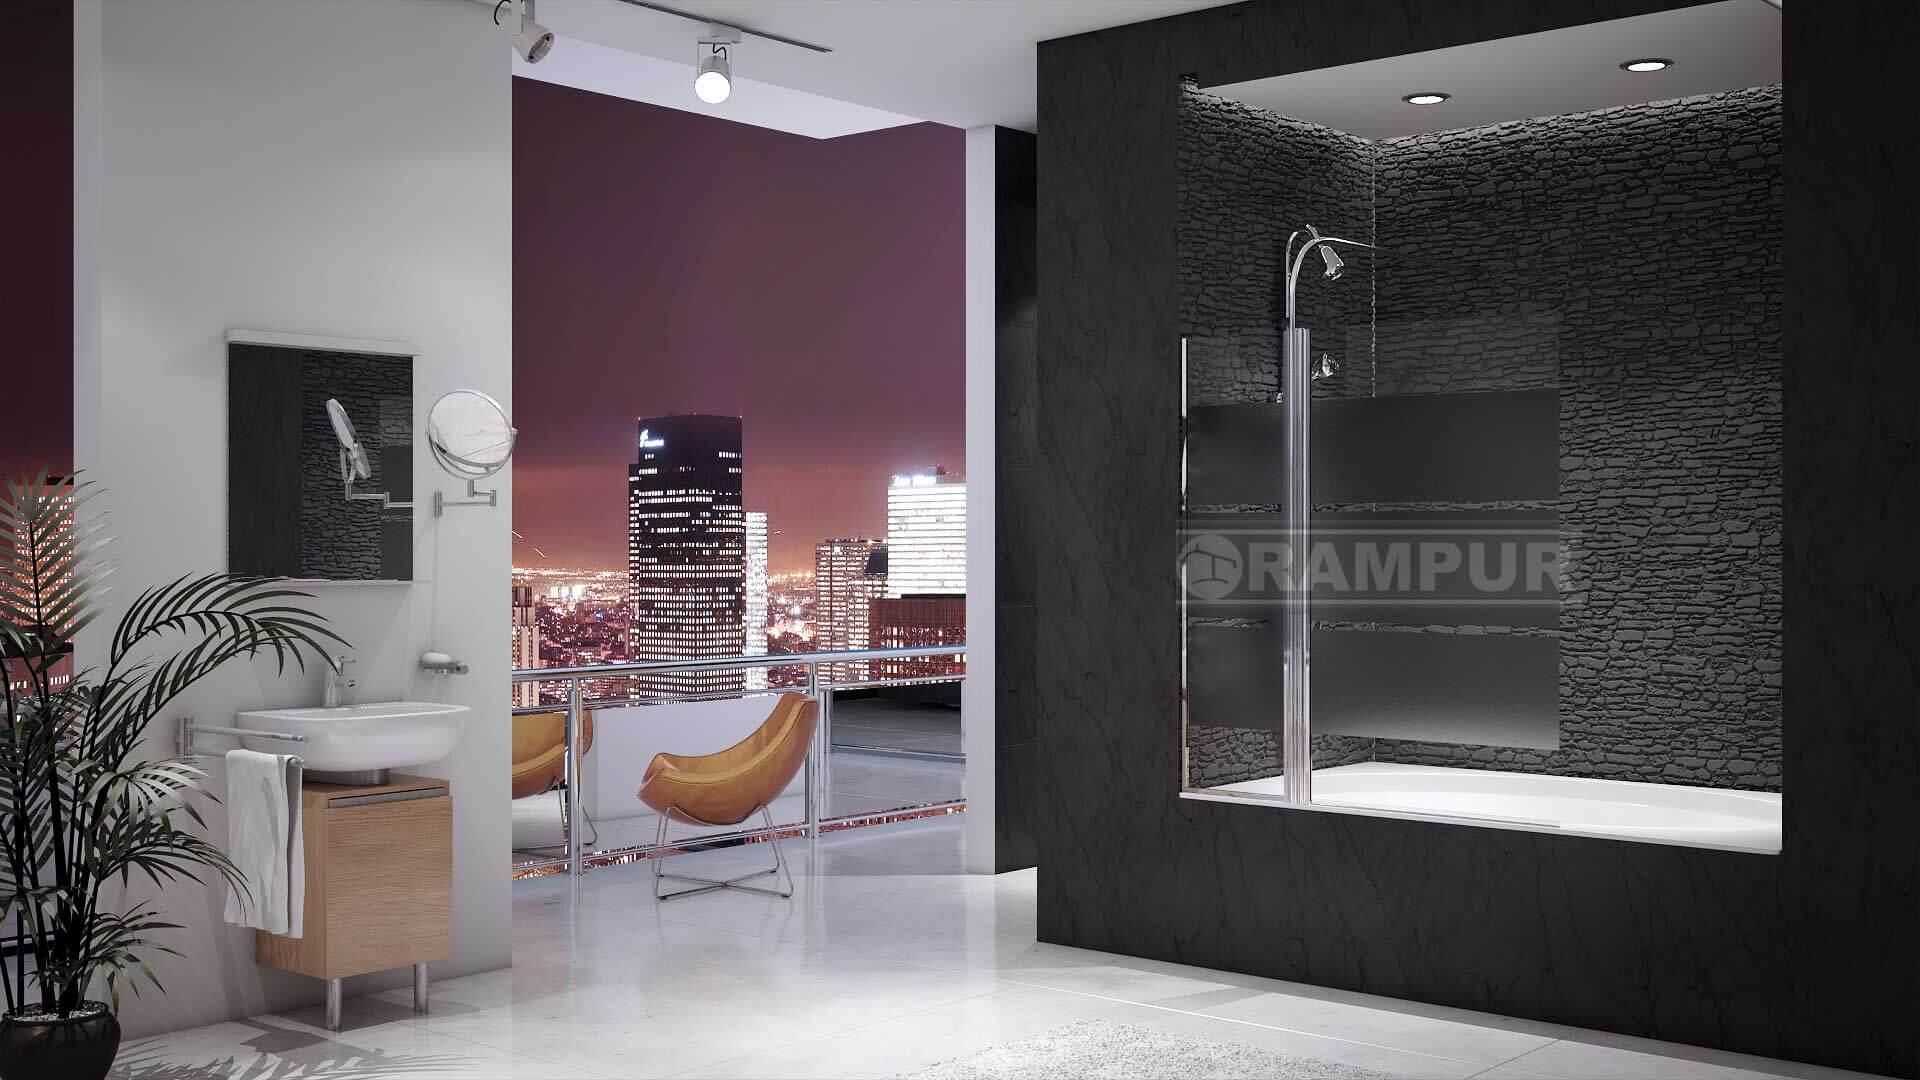 Mamparas Para Baño Rampur:RAMPUR® Mampara De Baño De Vidrio BERMEJO Premium